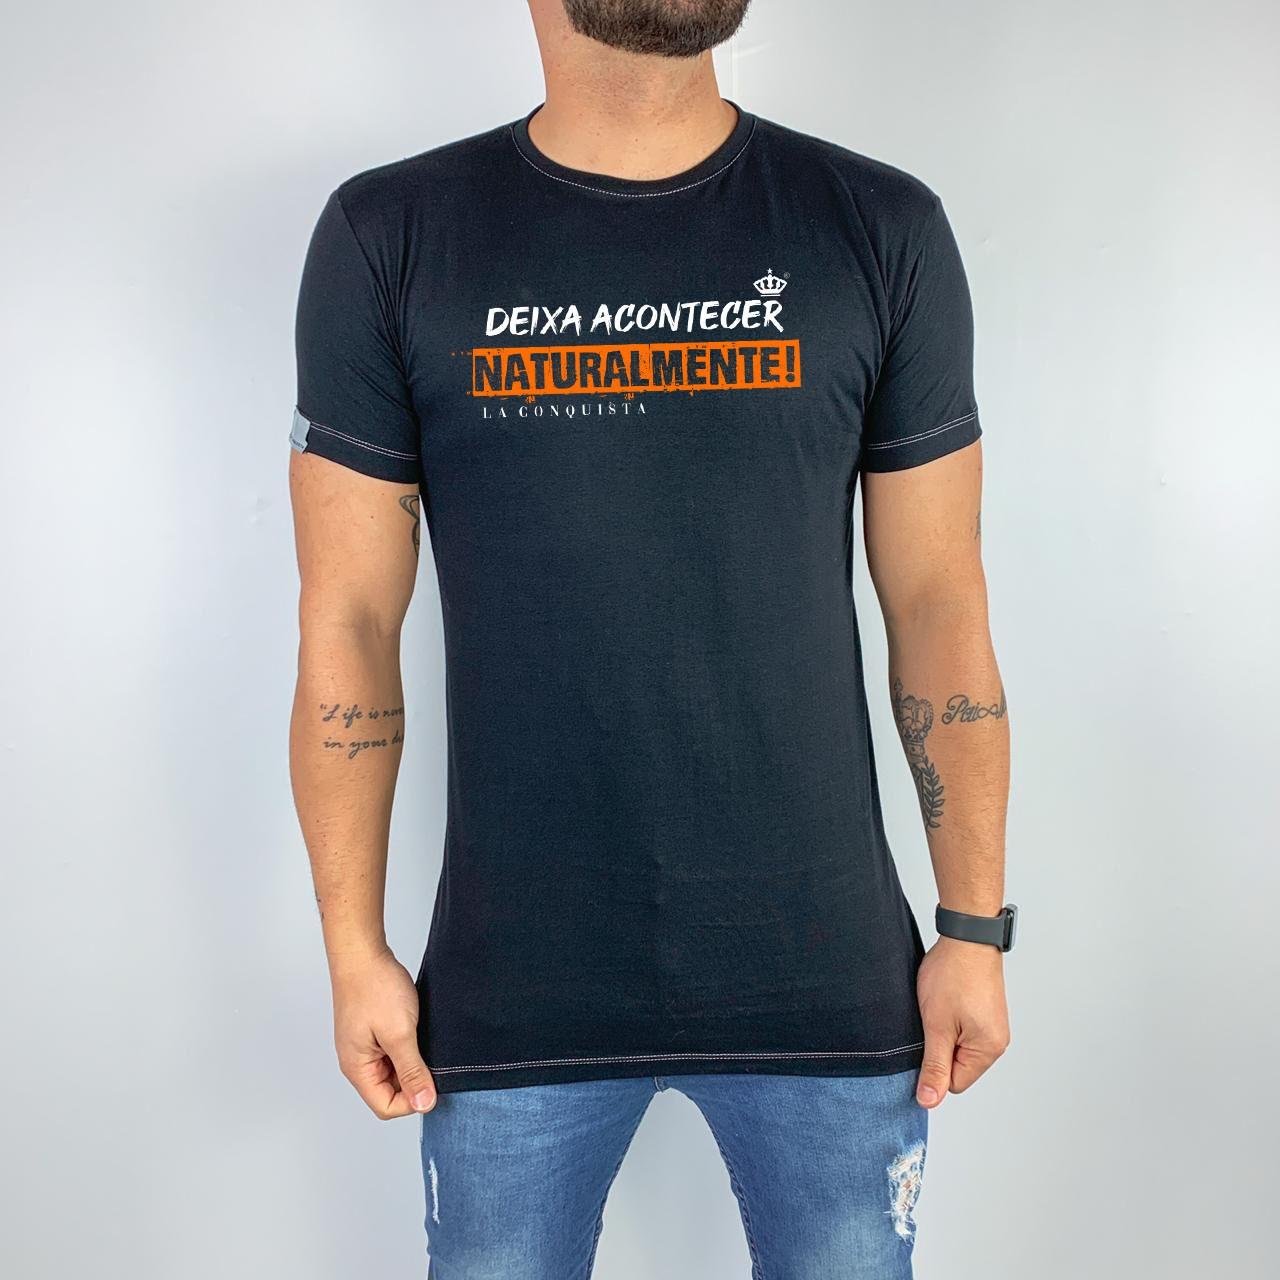 Camiseta Deixa acontecer naturalmente